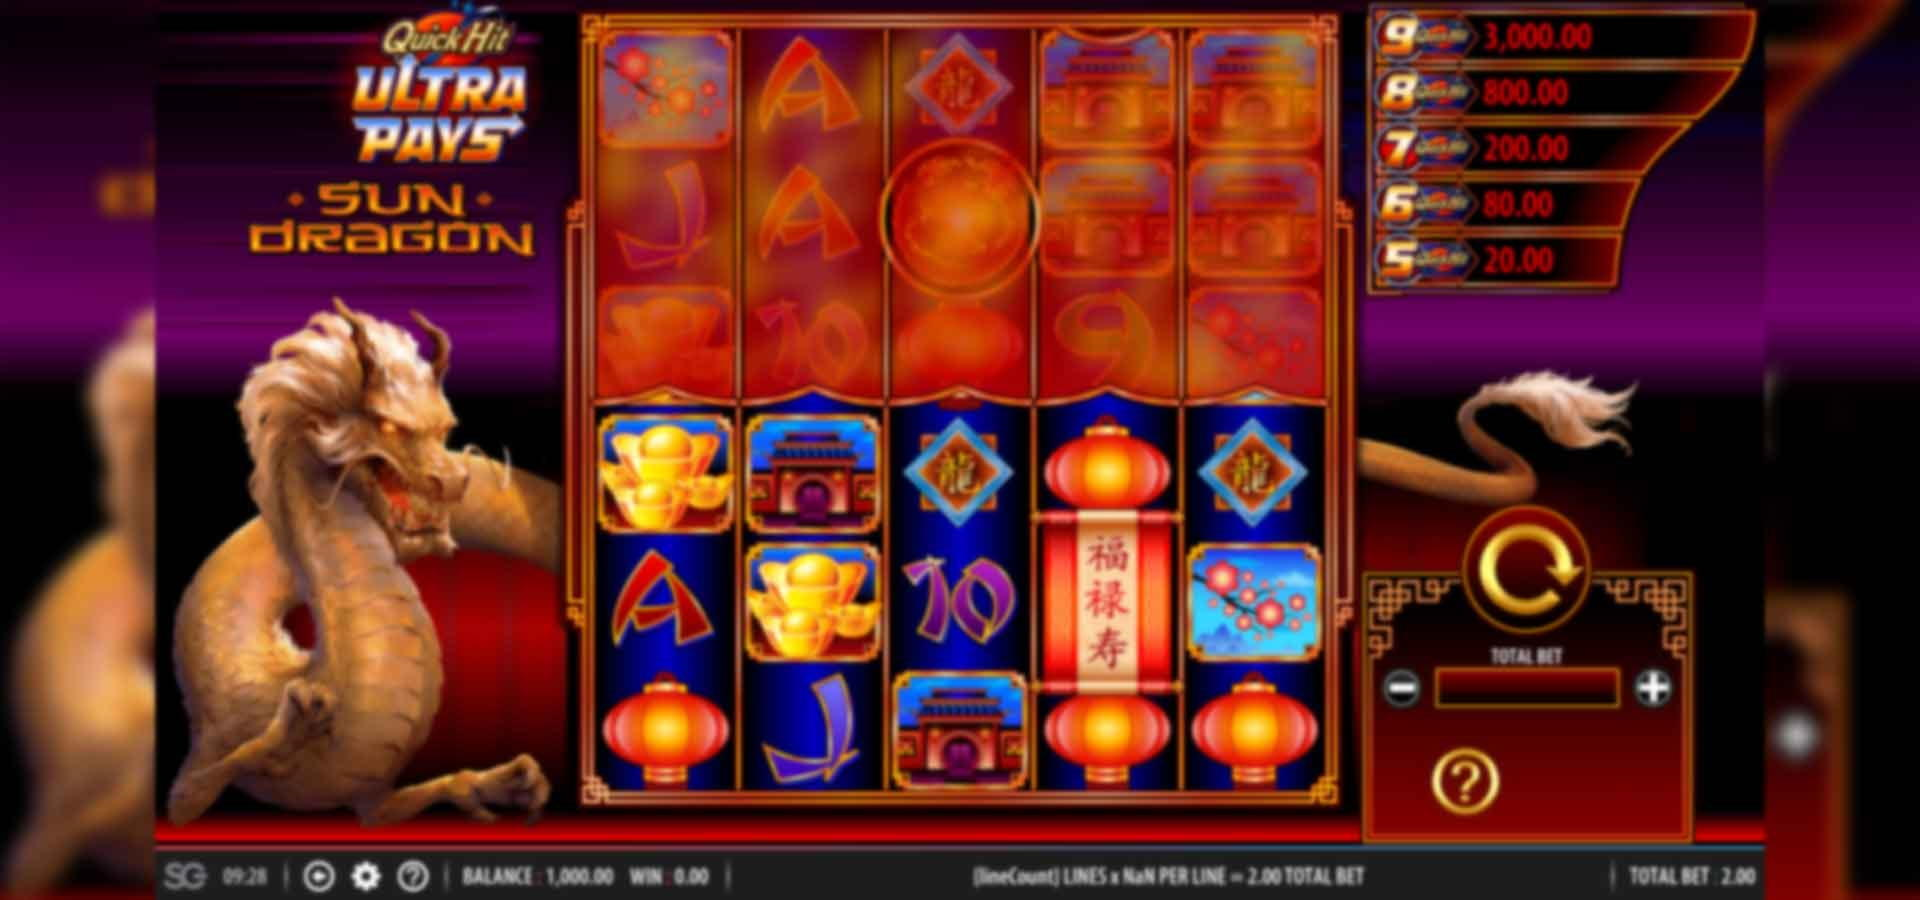 660% Match Bonus Casino at Casino.com